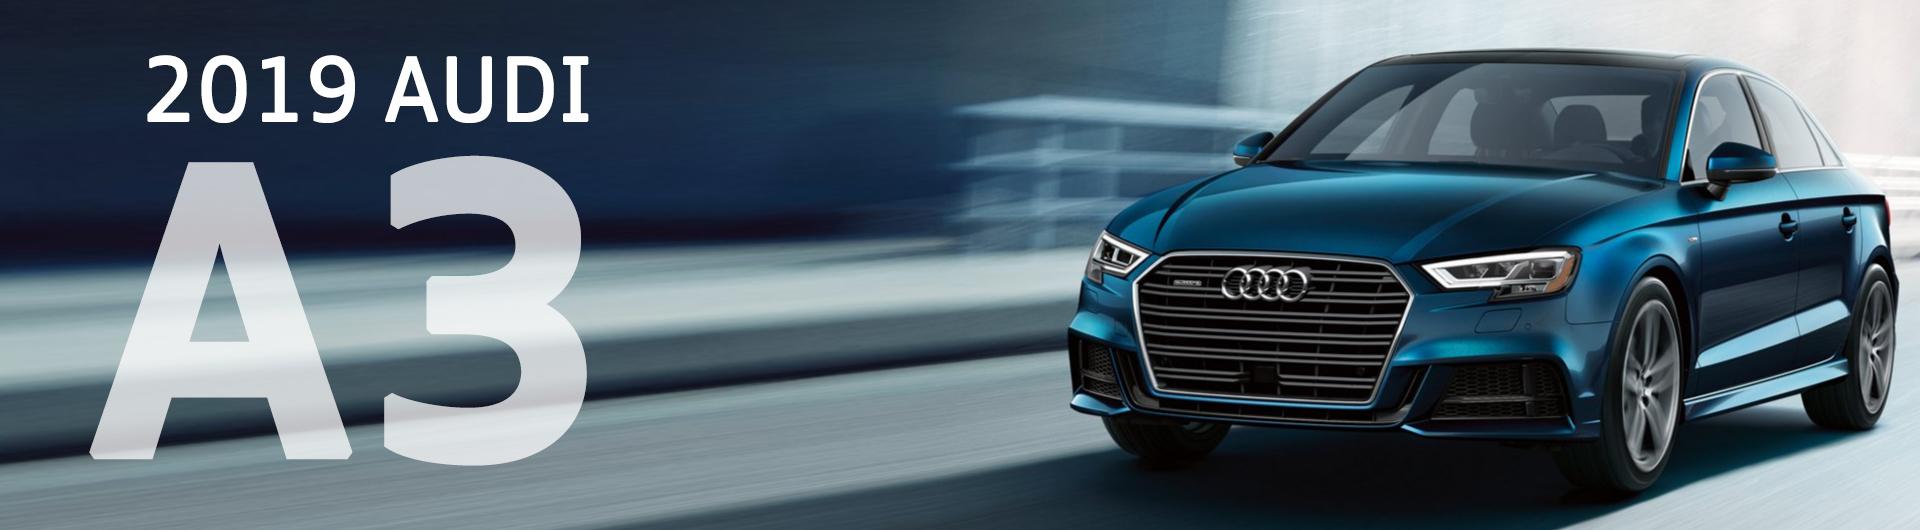 2019 Audi A3 | Flemington Audi